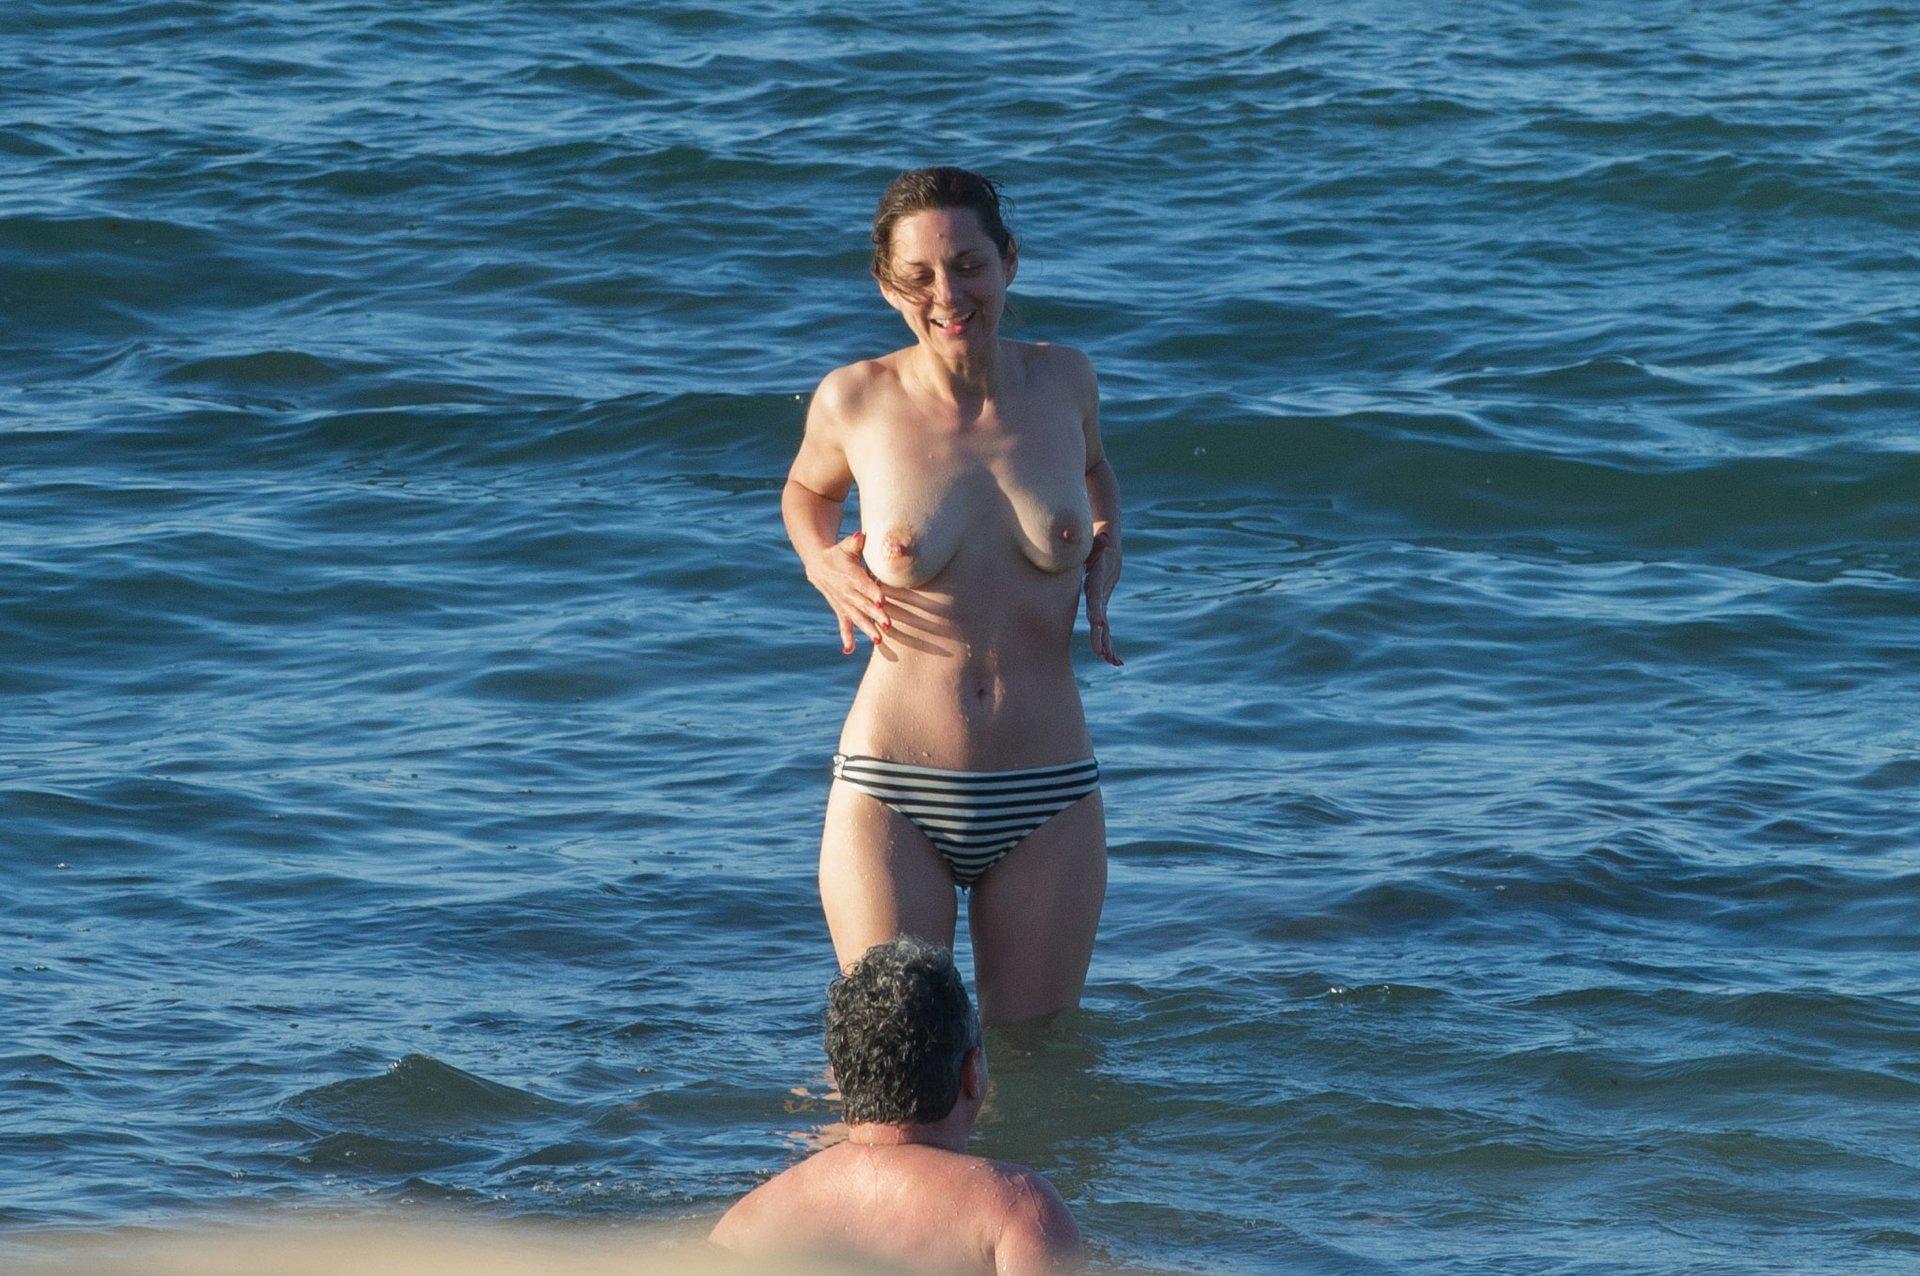 Marion Cotillard Sexy Pics